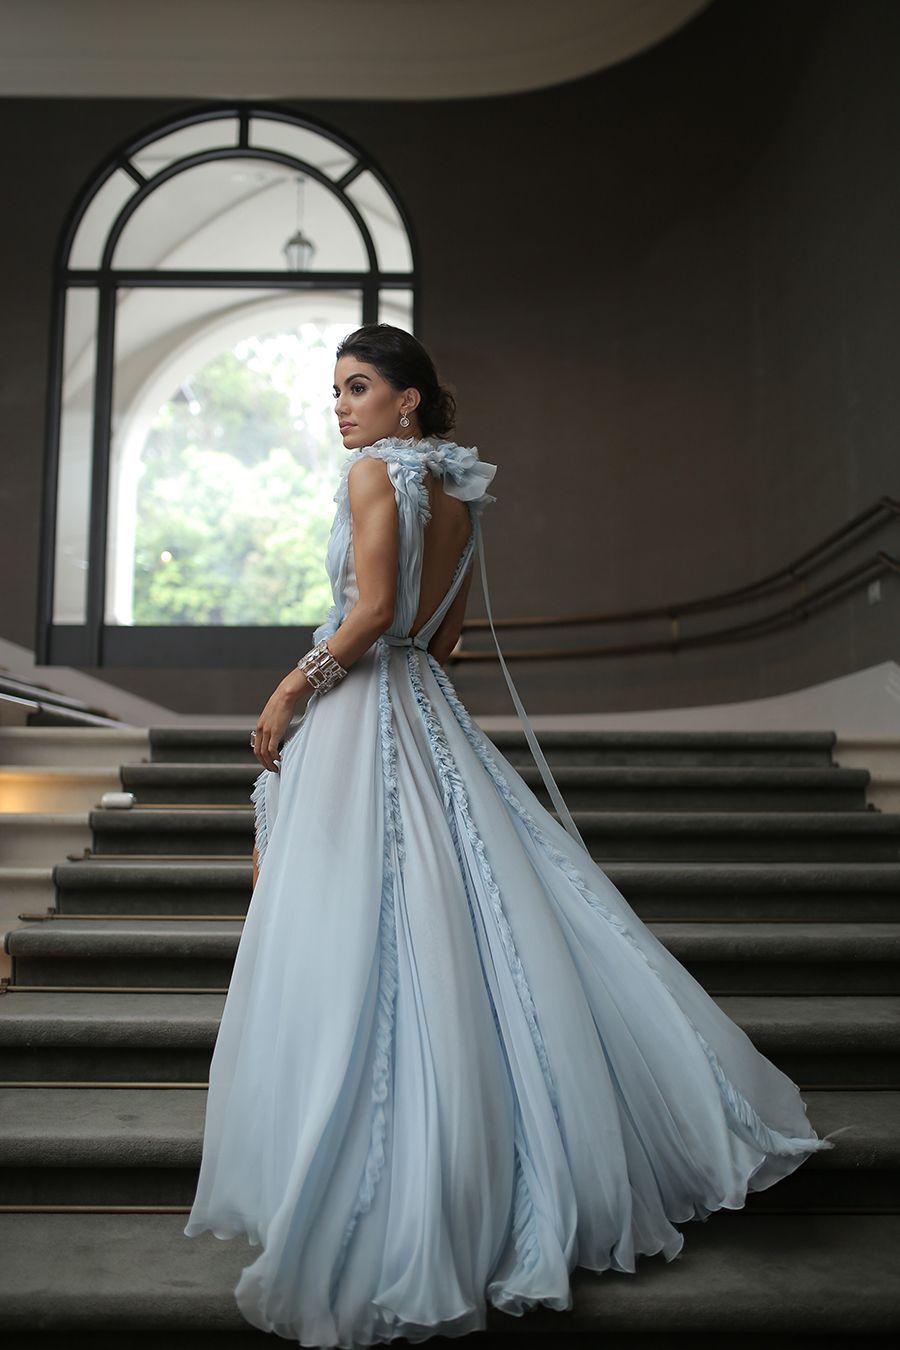 Camila Coelho | Camila Coelho | Pinterest | Red carpet and Fashion